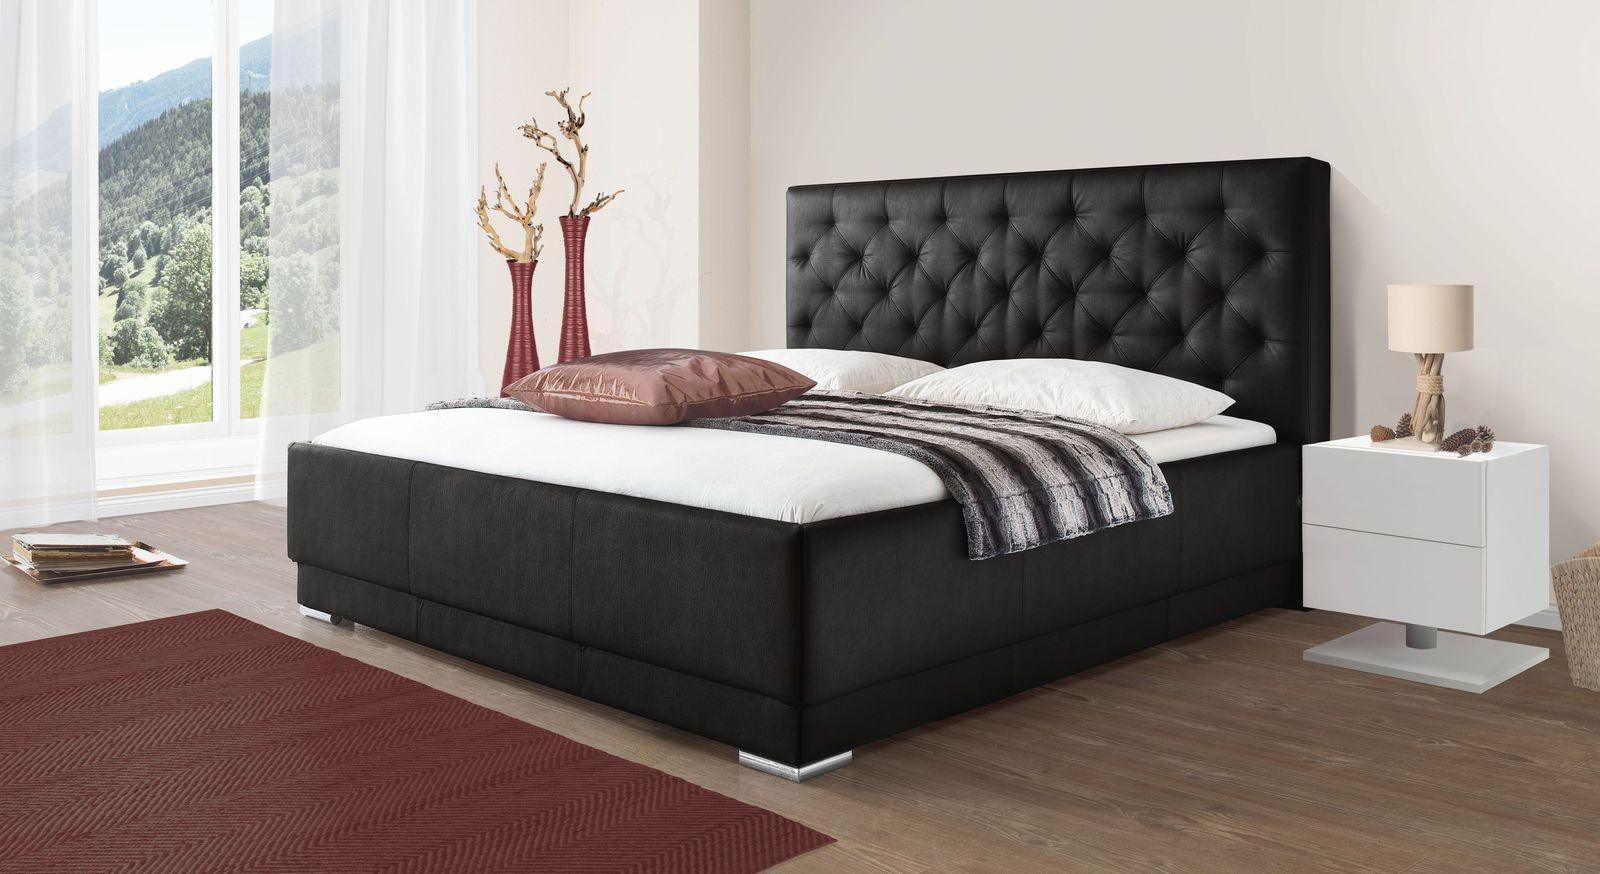 Bett Castletown mit schwarzem Kunstlederbezug